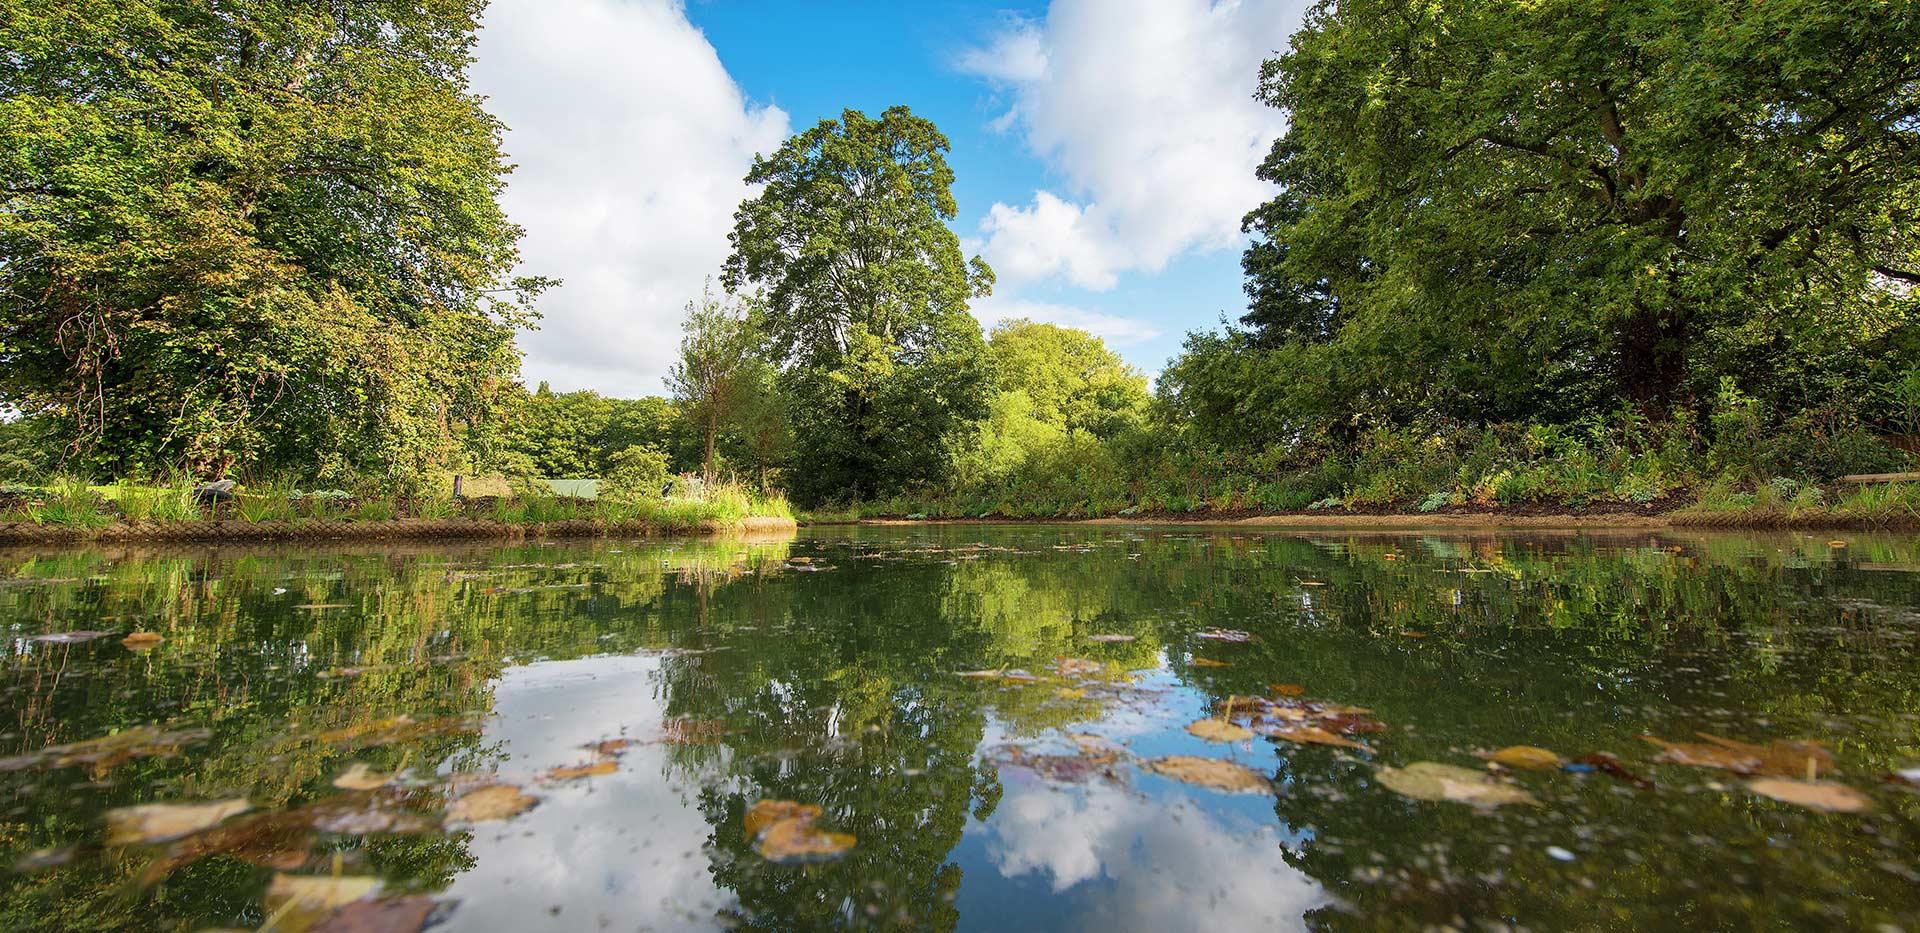 St James, Fitzroy Gate, River, Mirror, Local Area